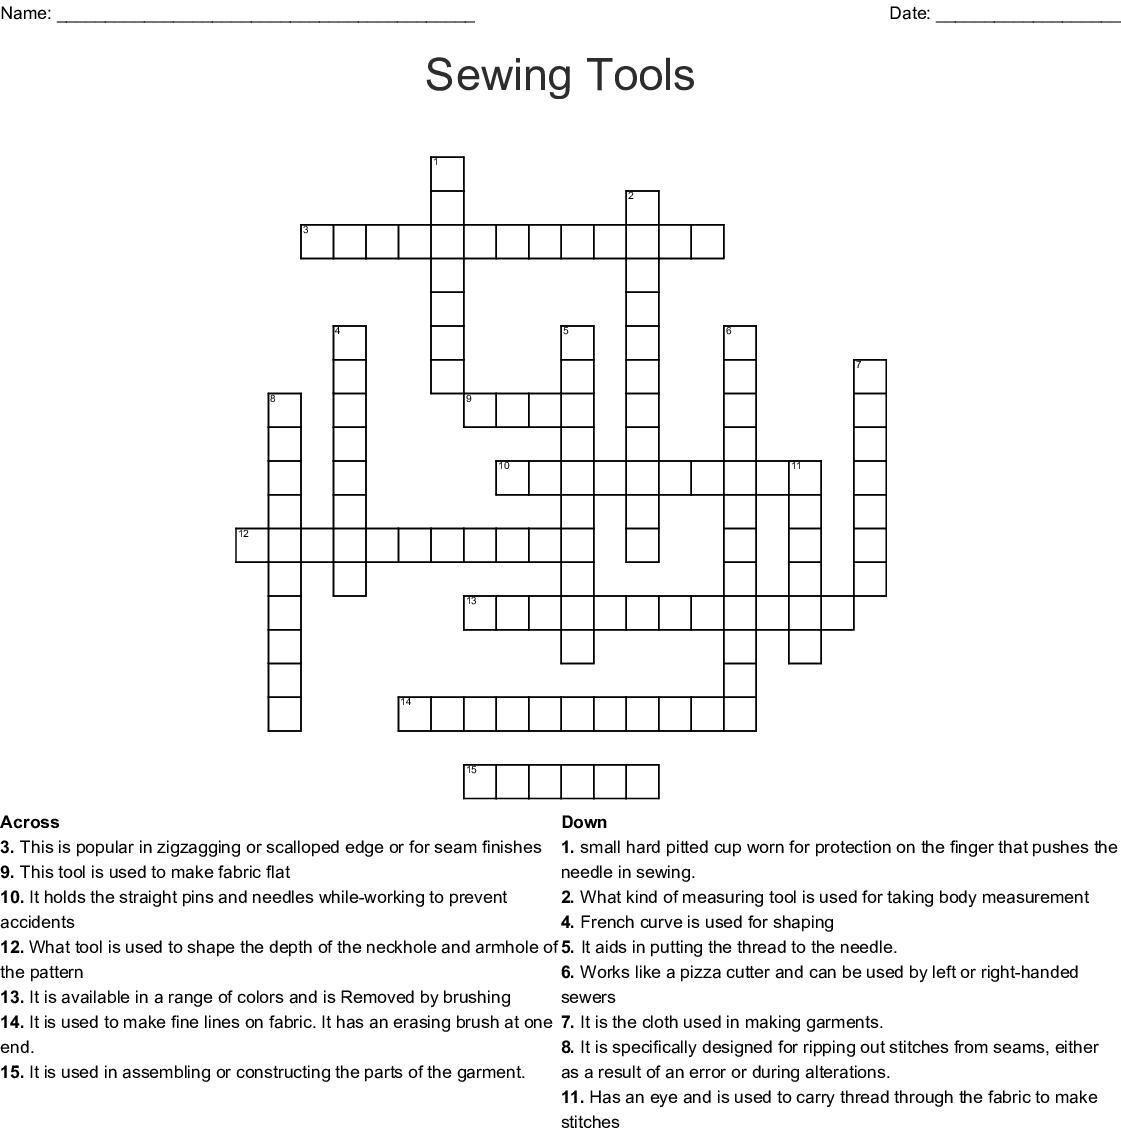 Sewing Tools Crossword Wordmint